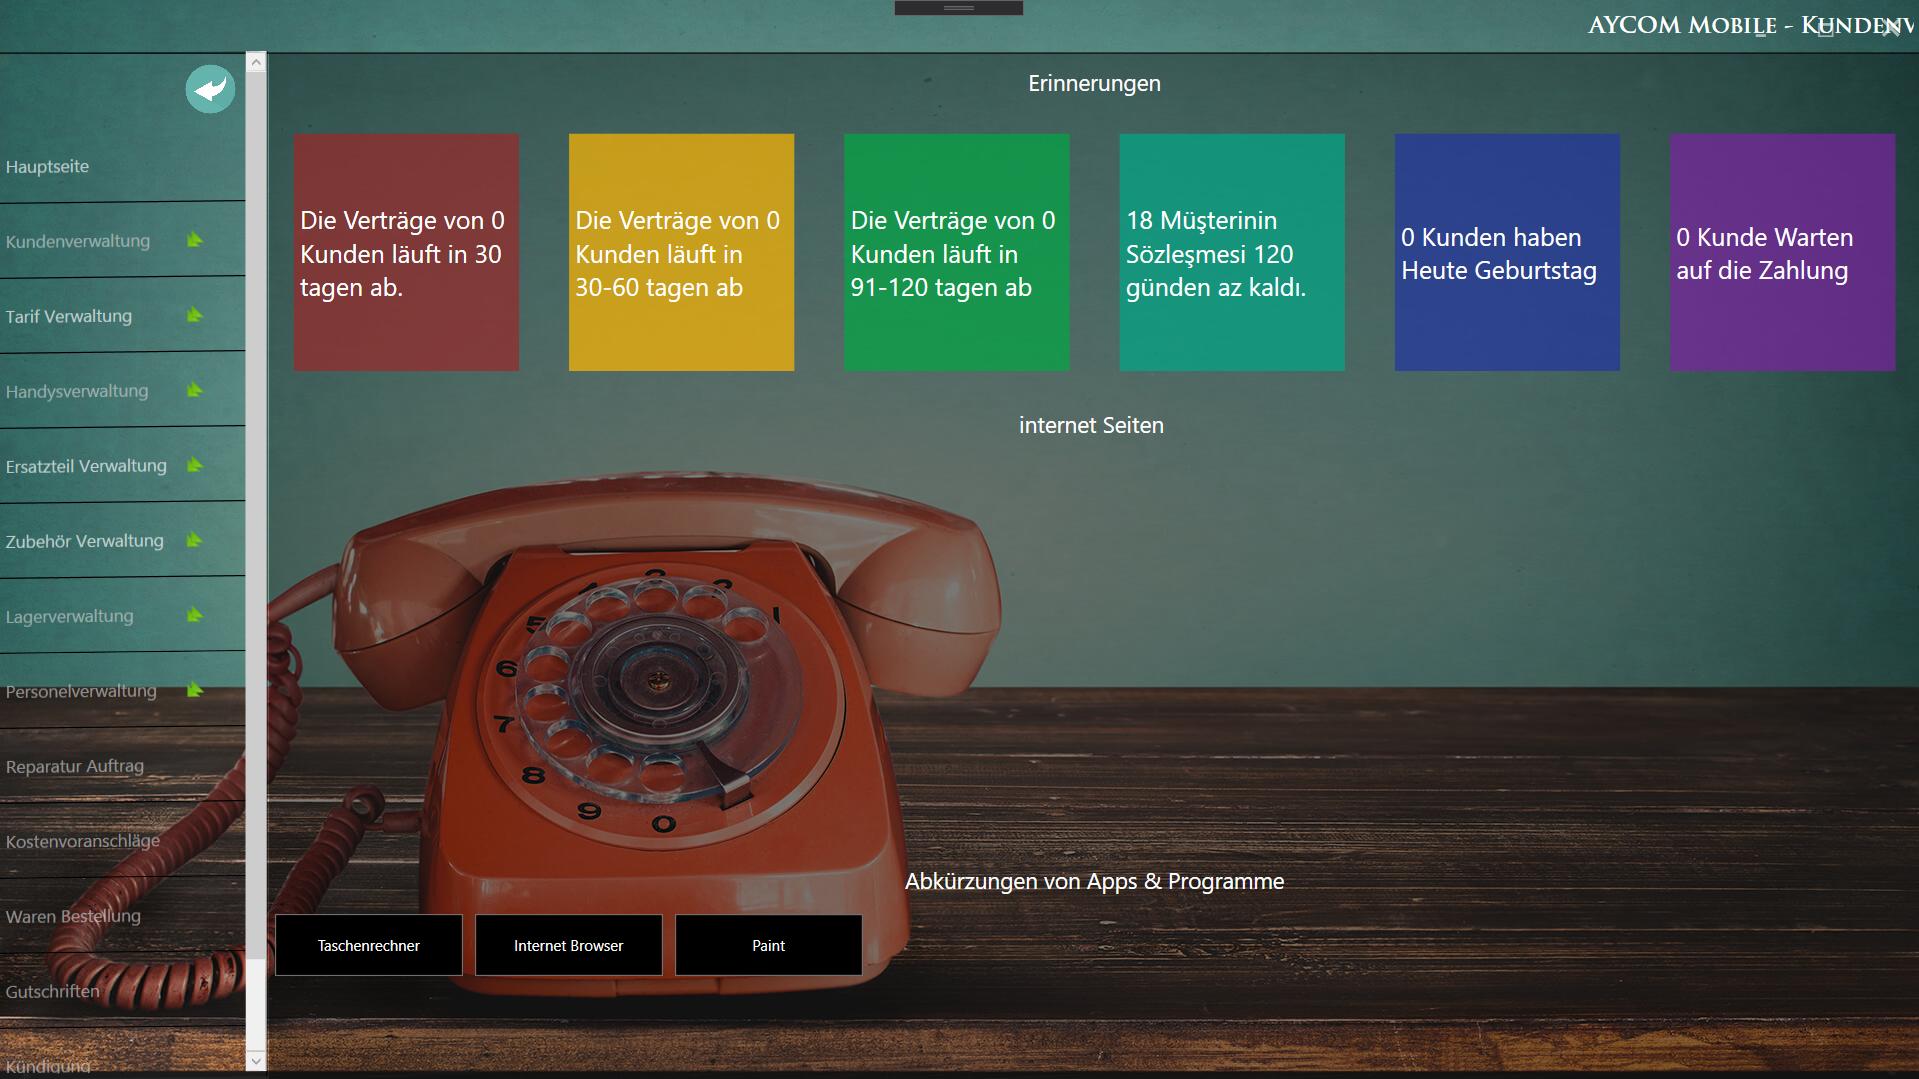 Telekom Müşteri Takip Projesine Ait Görsel